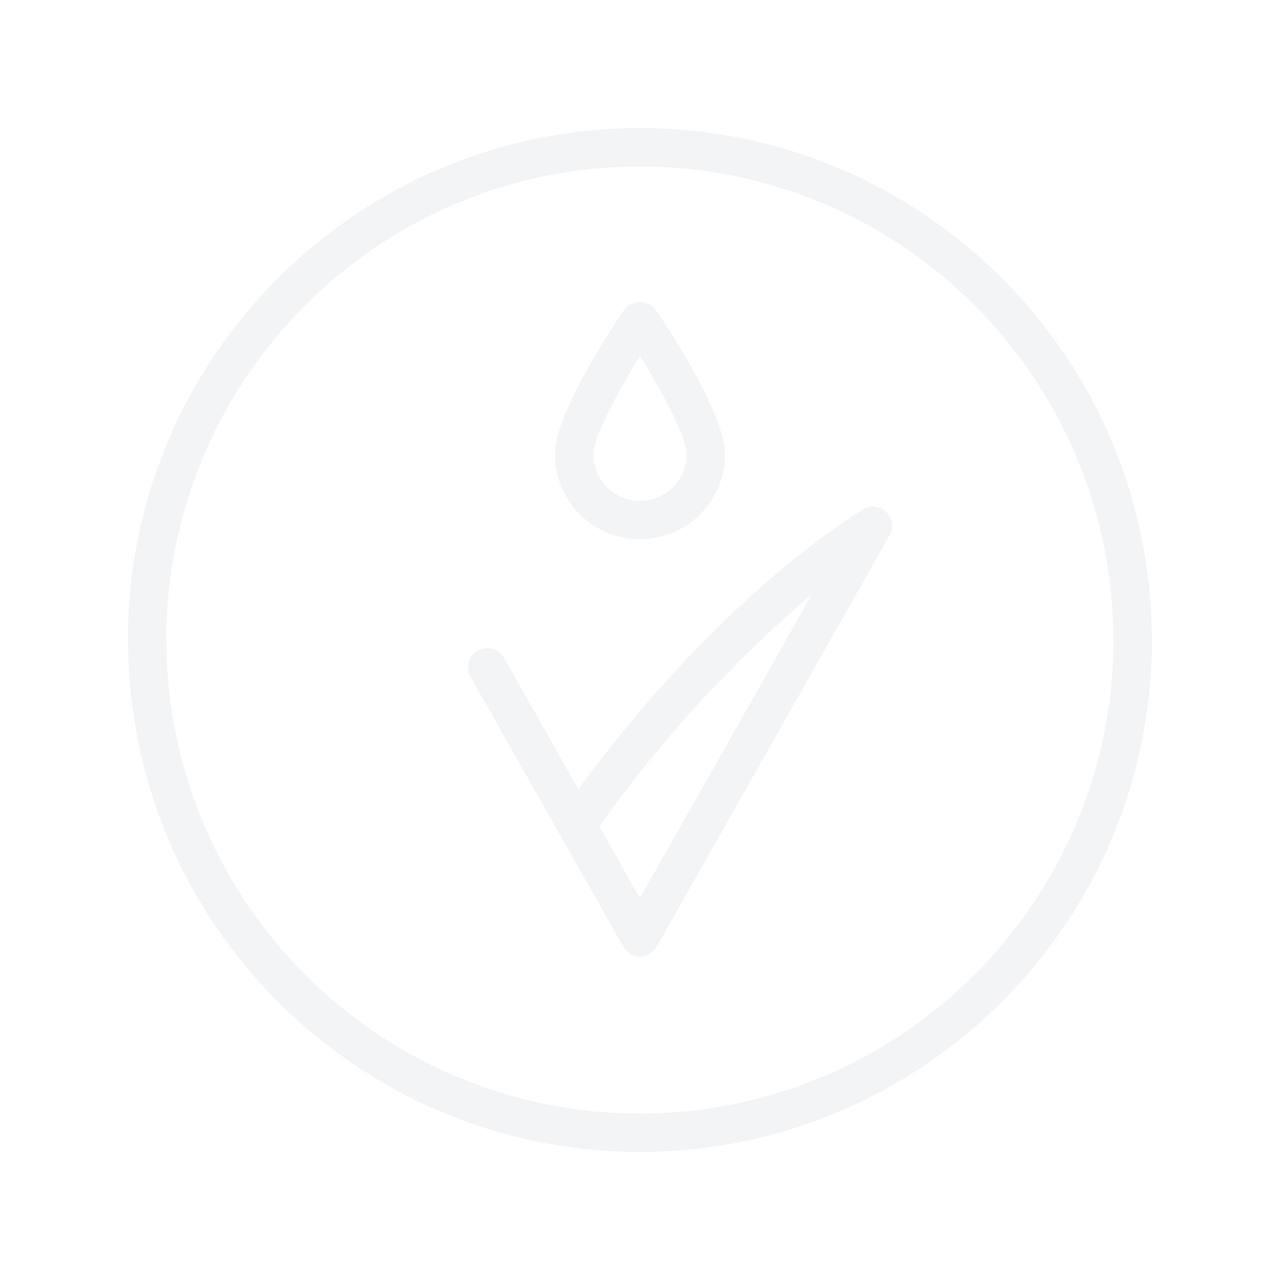 L'OREAL La Petite Mini Eyeshadow Palette 4g